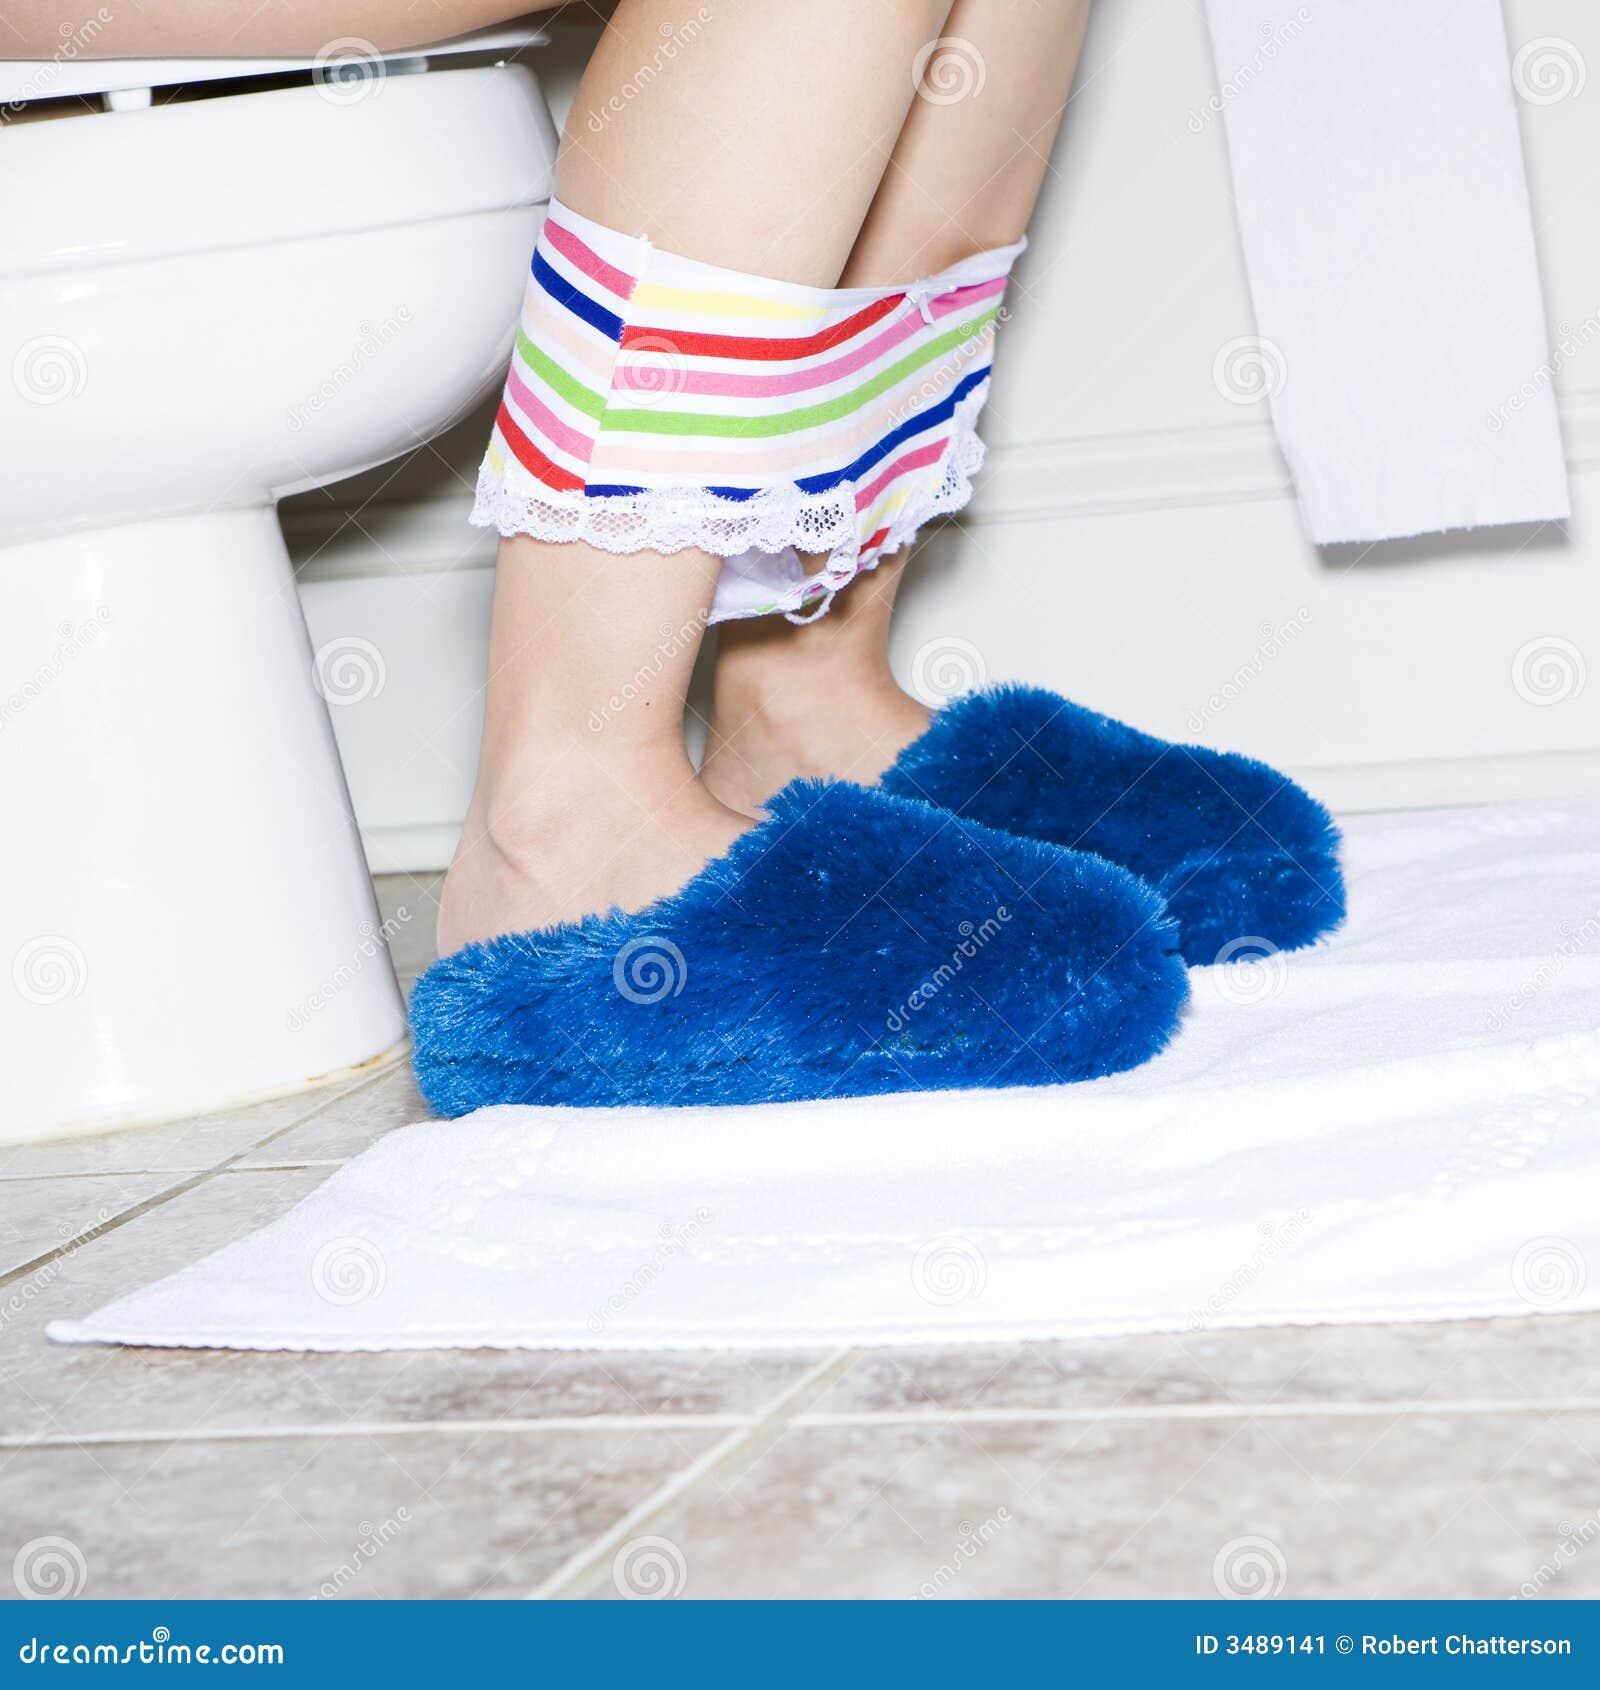 Women on toilet pics